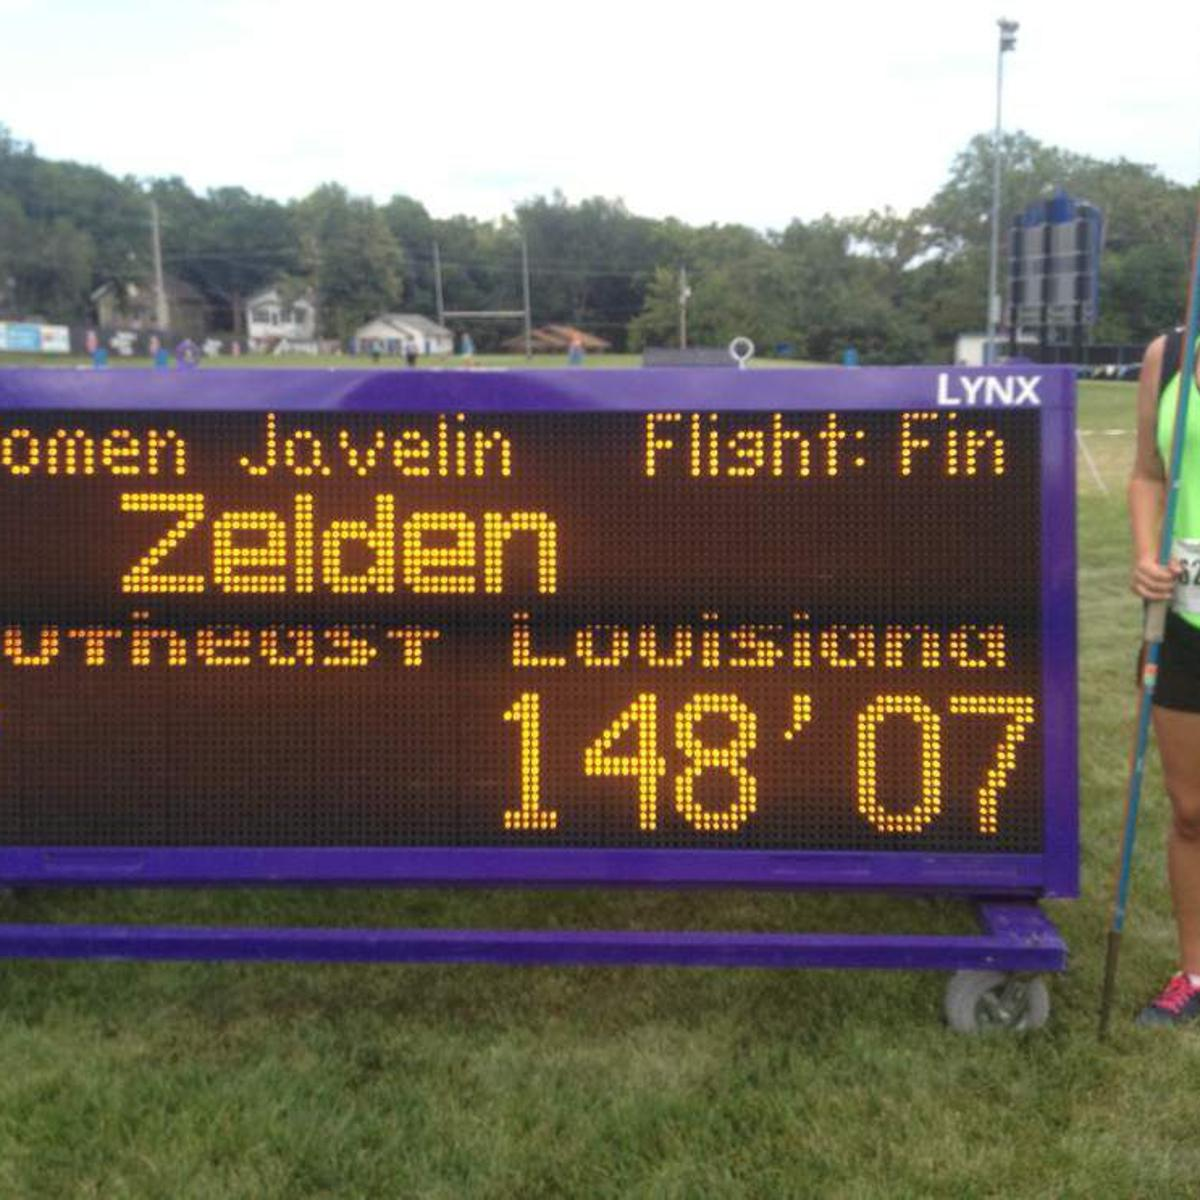 St. Scholastica's Samantha Zelden wins AAU Junior Olympics javelin title |  Prep Sports | nola.com